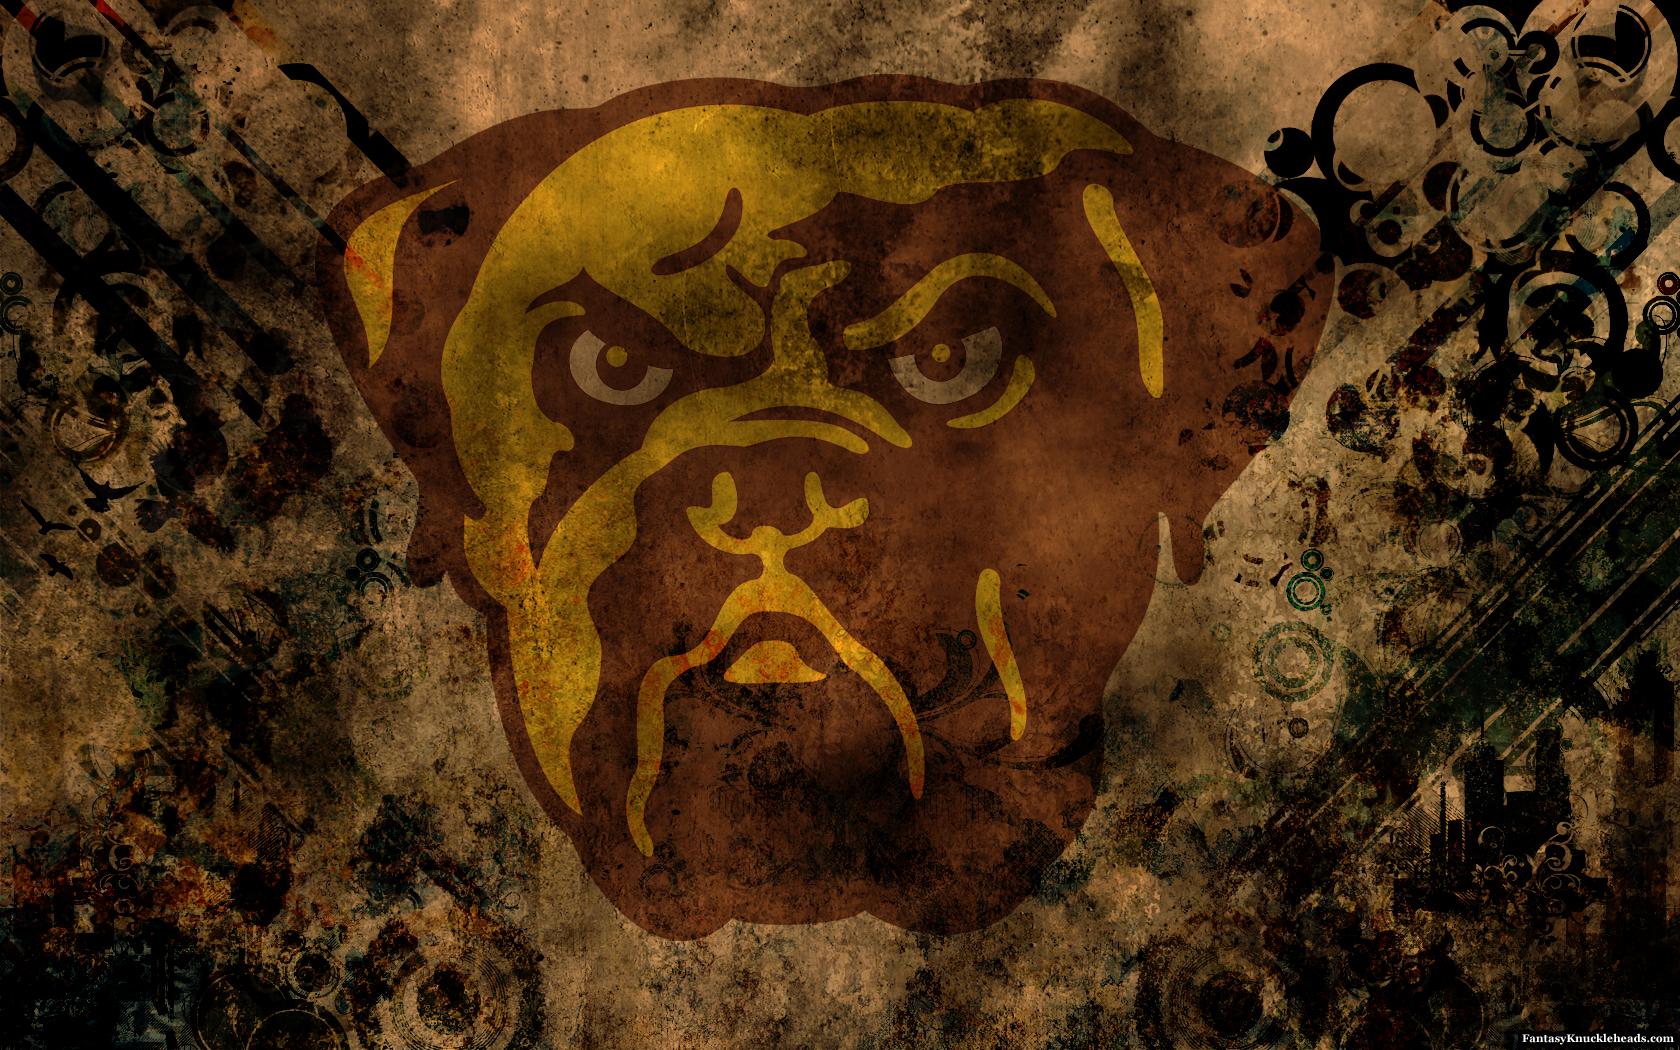 Cleveland Browns Wallpaper 2012 1680x1050